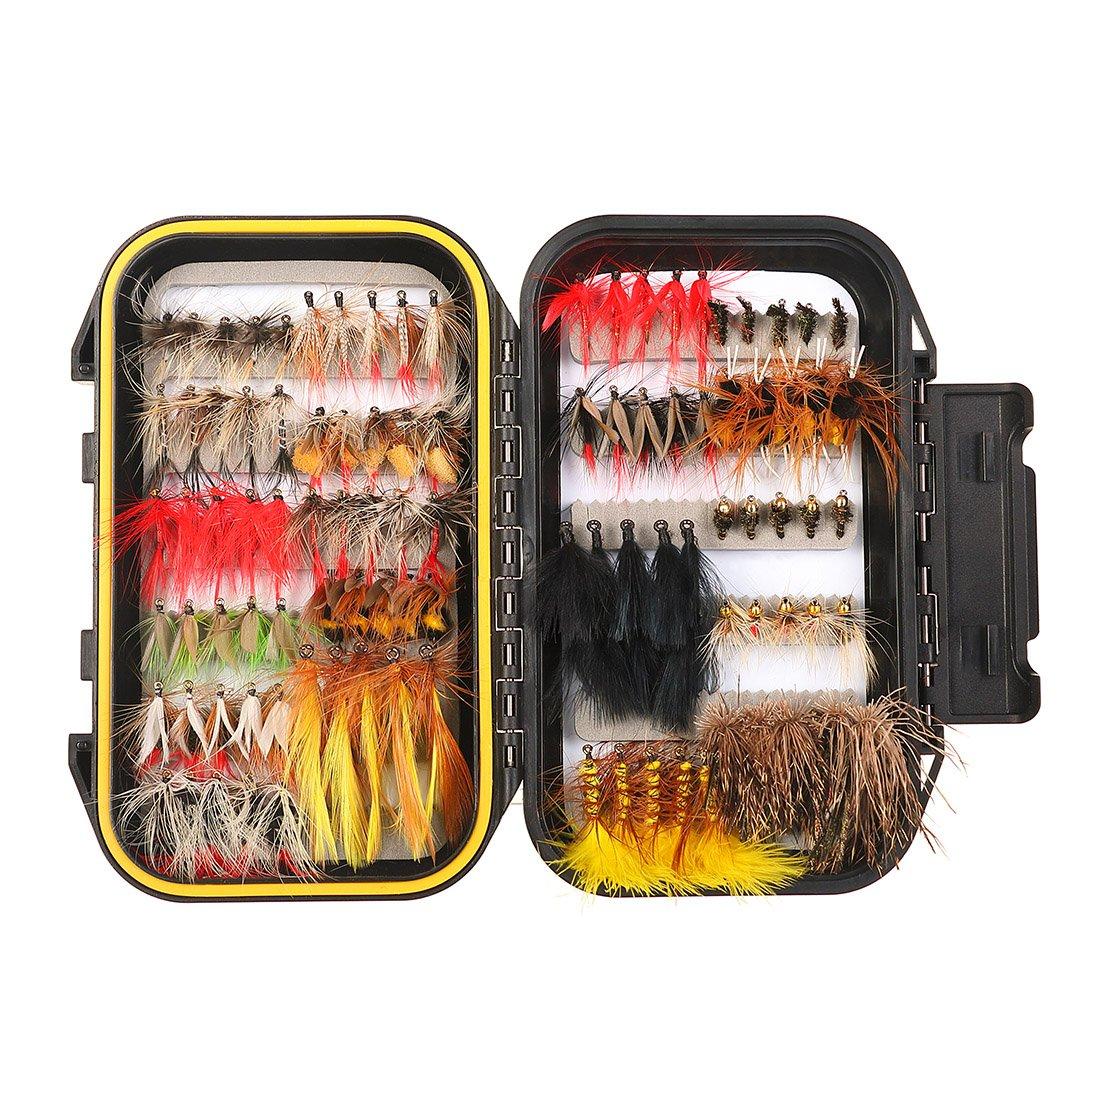 FISHINGSIR 100PCS Fly Fishing Flies Kit Assorted Flies Trout Flies Fly Fishing Lures with Waterproof Fly Box by FISHINGSIR